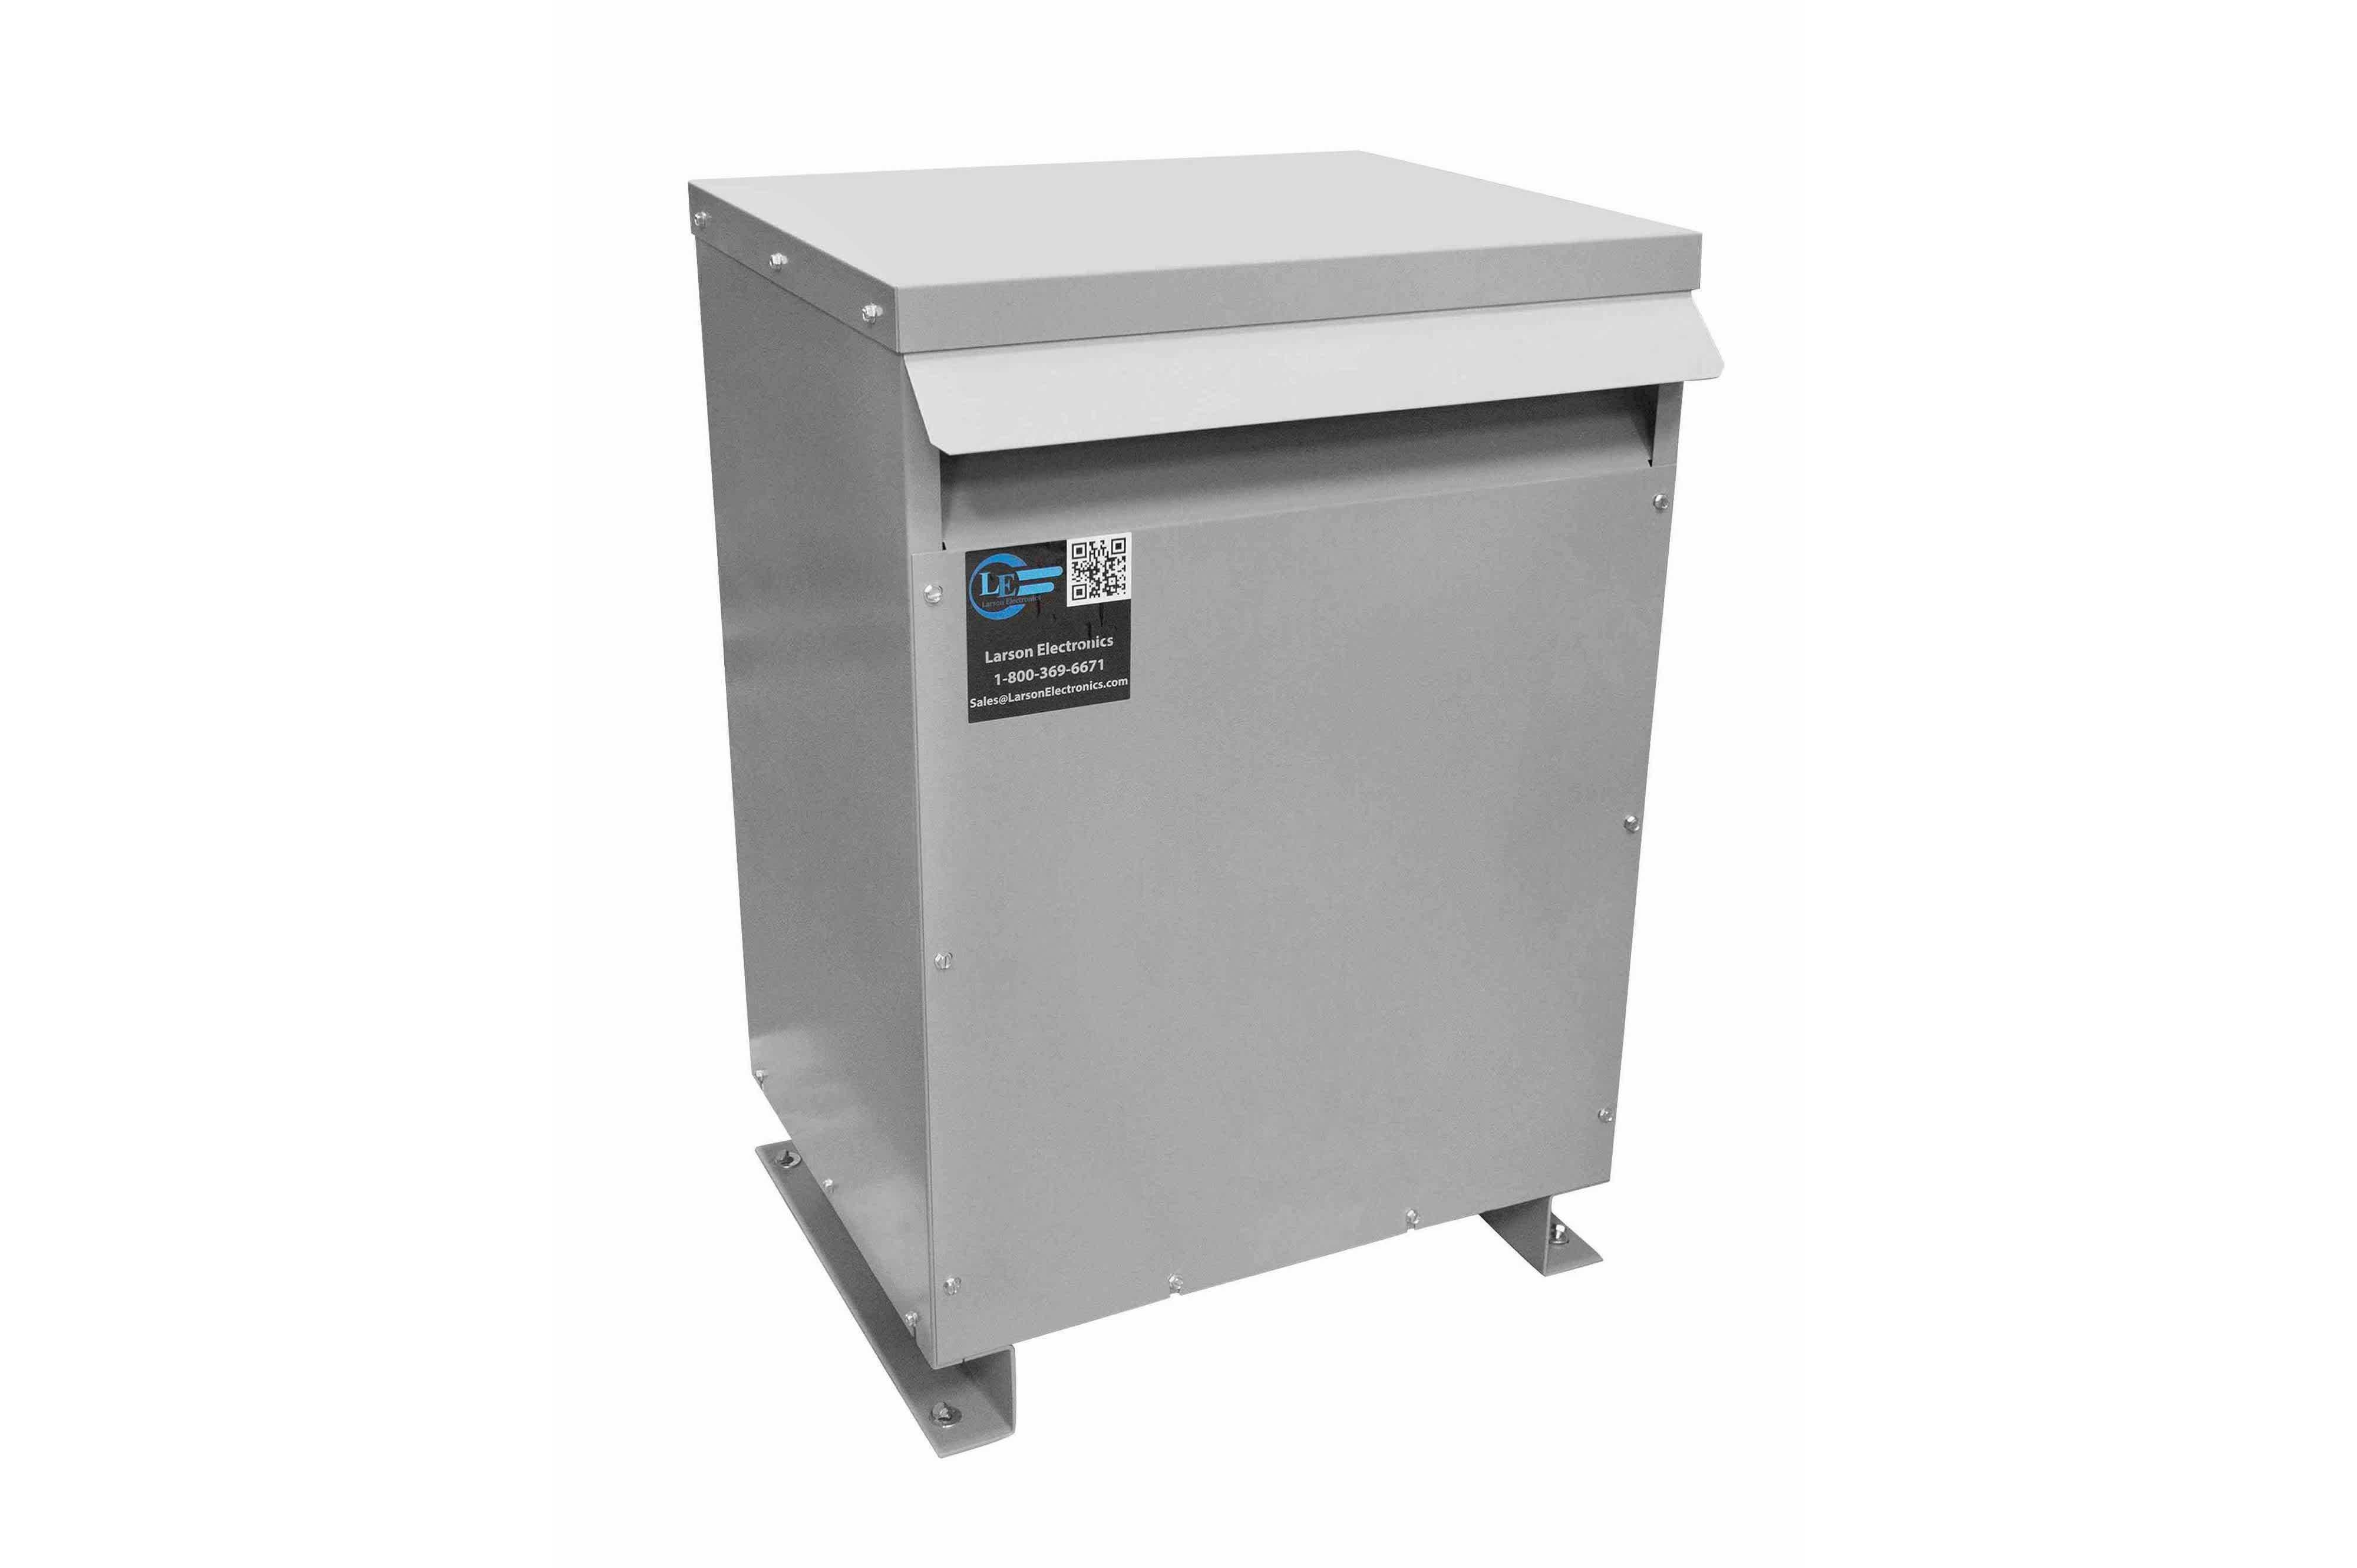 28 kVA 3PH Isolation Transformer, 600V Wye Primary, 415V Delta Secondary, N3R, Ventilated, 60 Hz